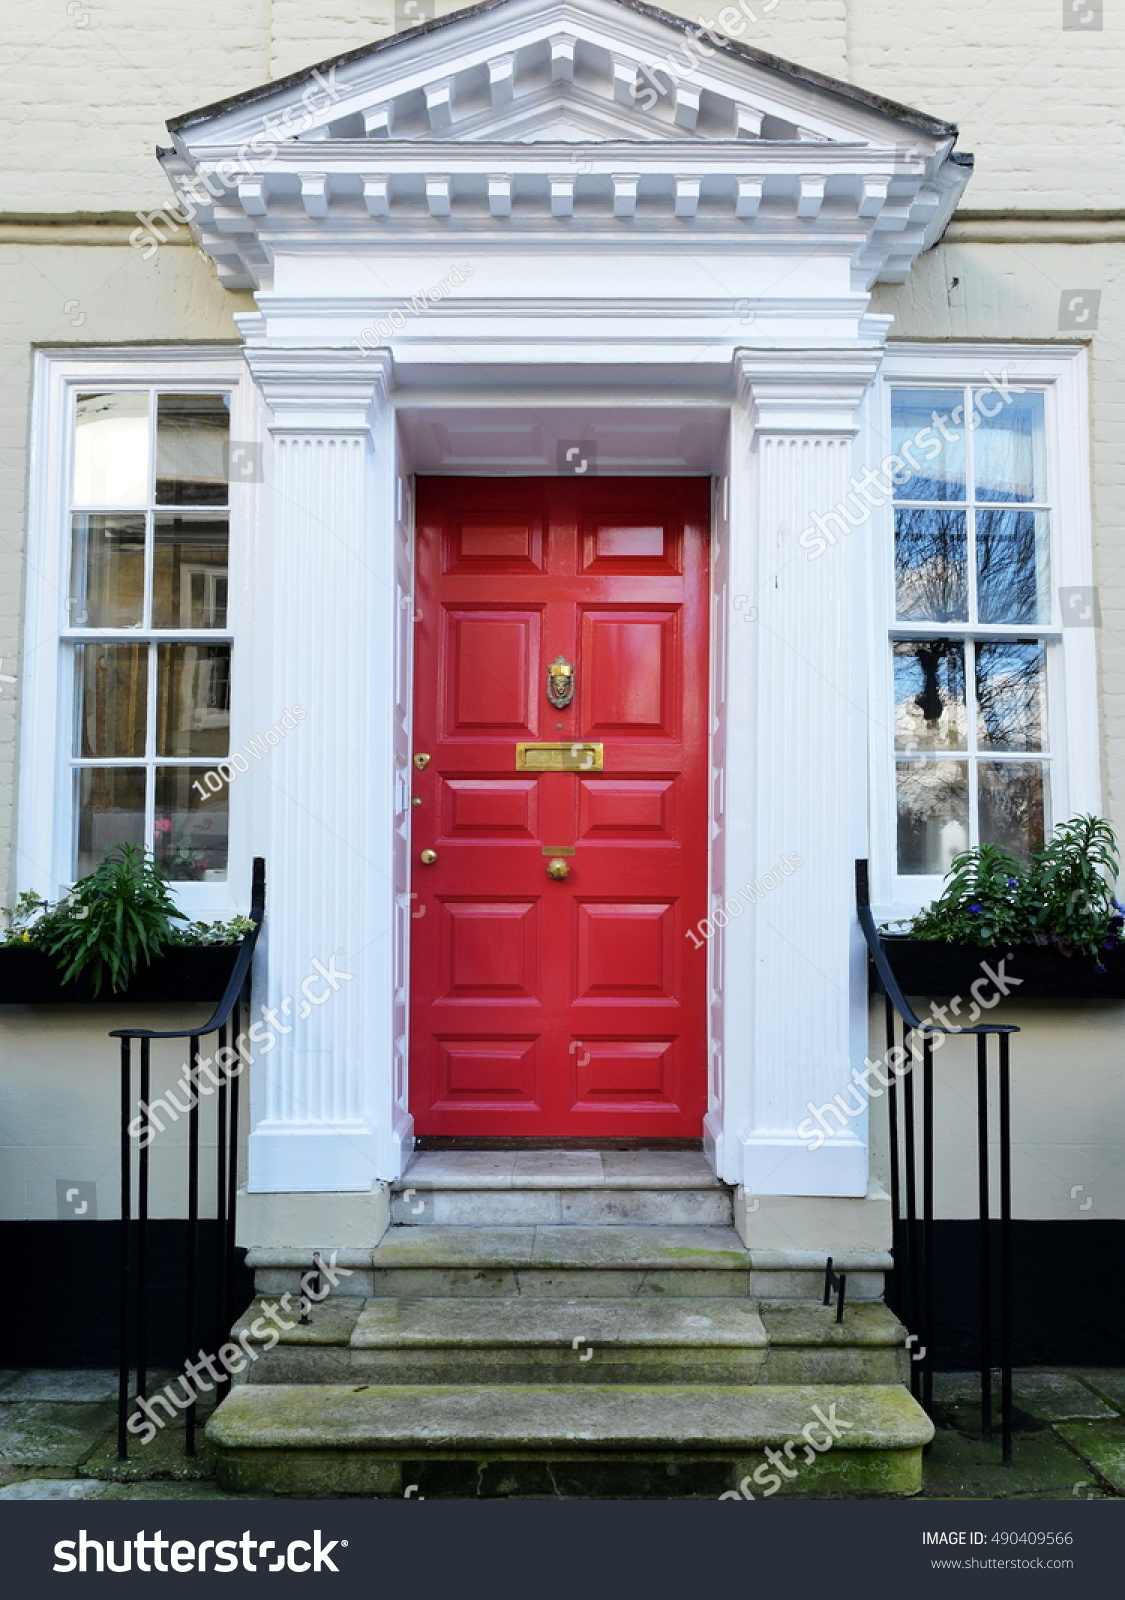 Red Front Door Attractive Old London Stock Photo 490409566 ...